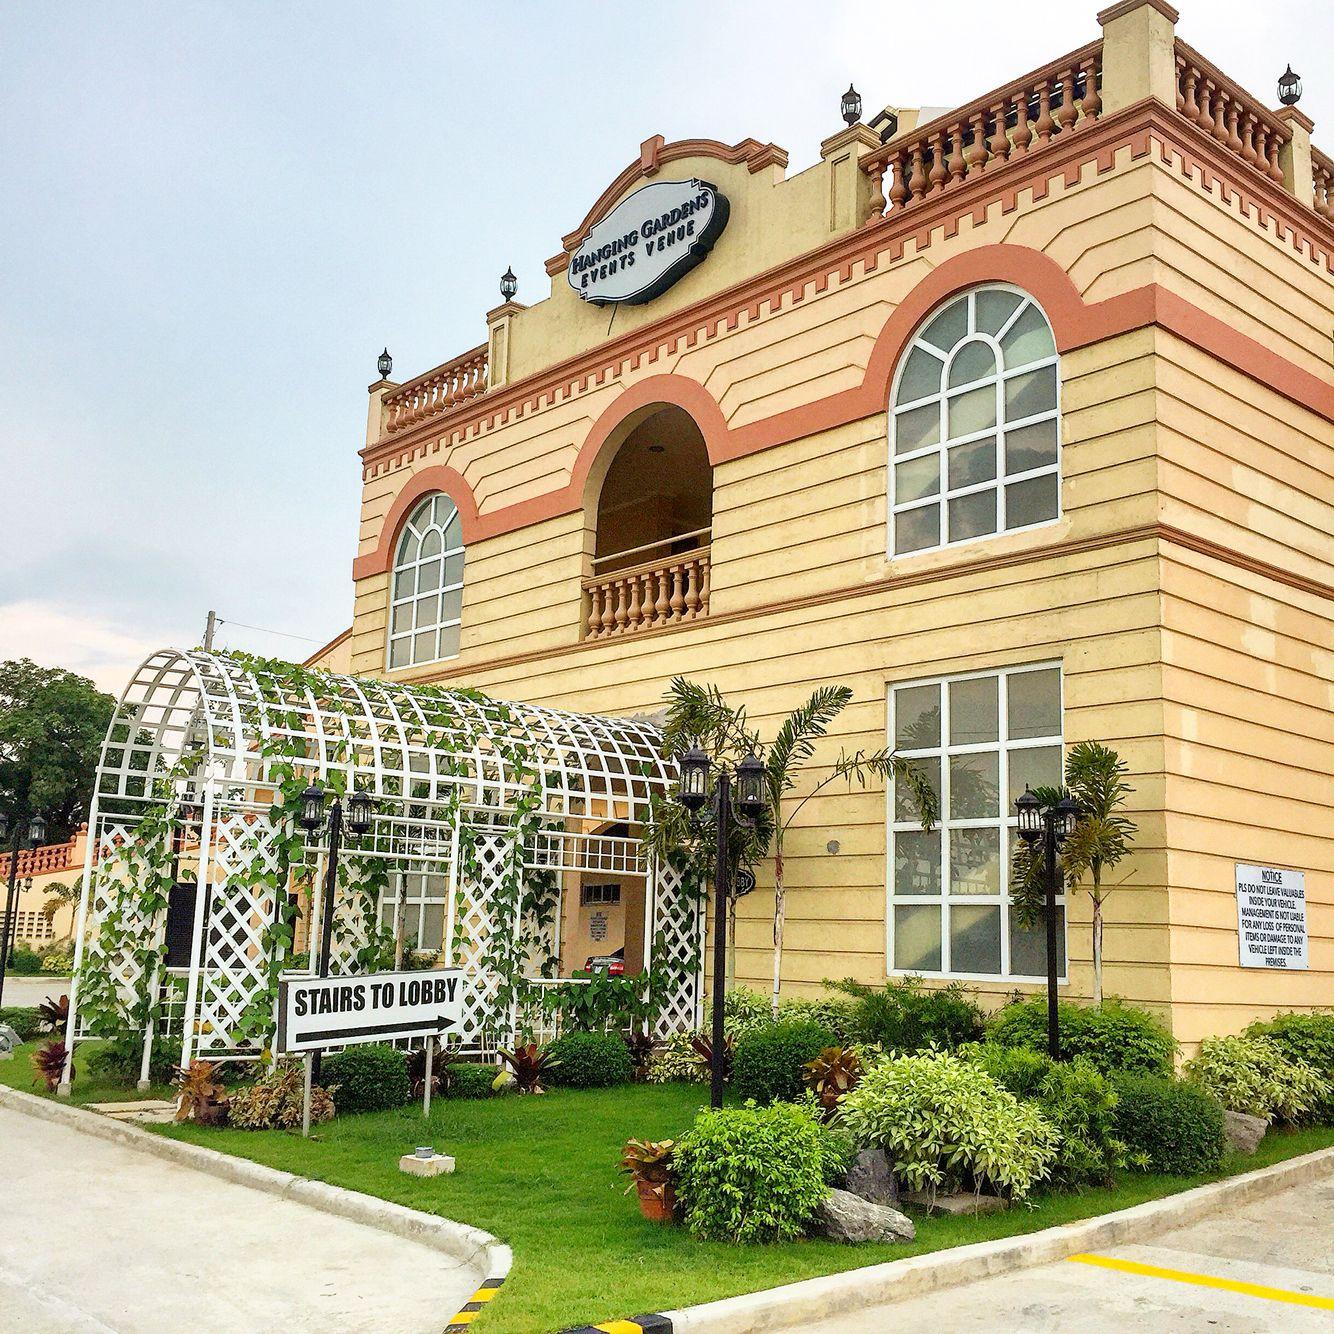 Wedding Venue In Quezon City: Hanging Gardens Event Venue @ Quezon City, Philippines